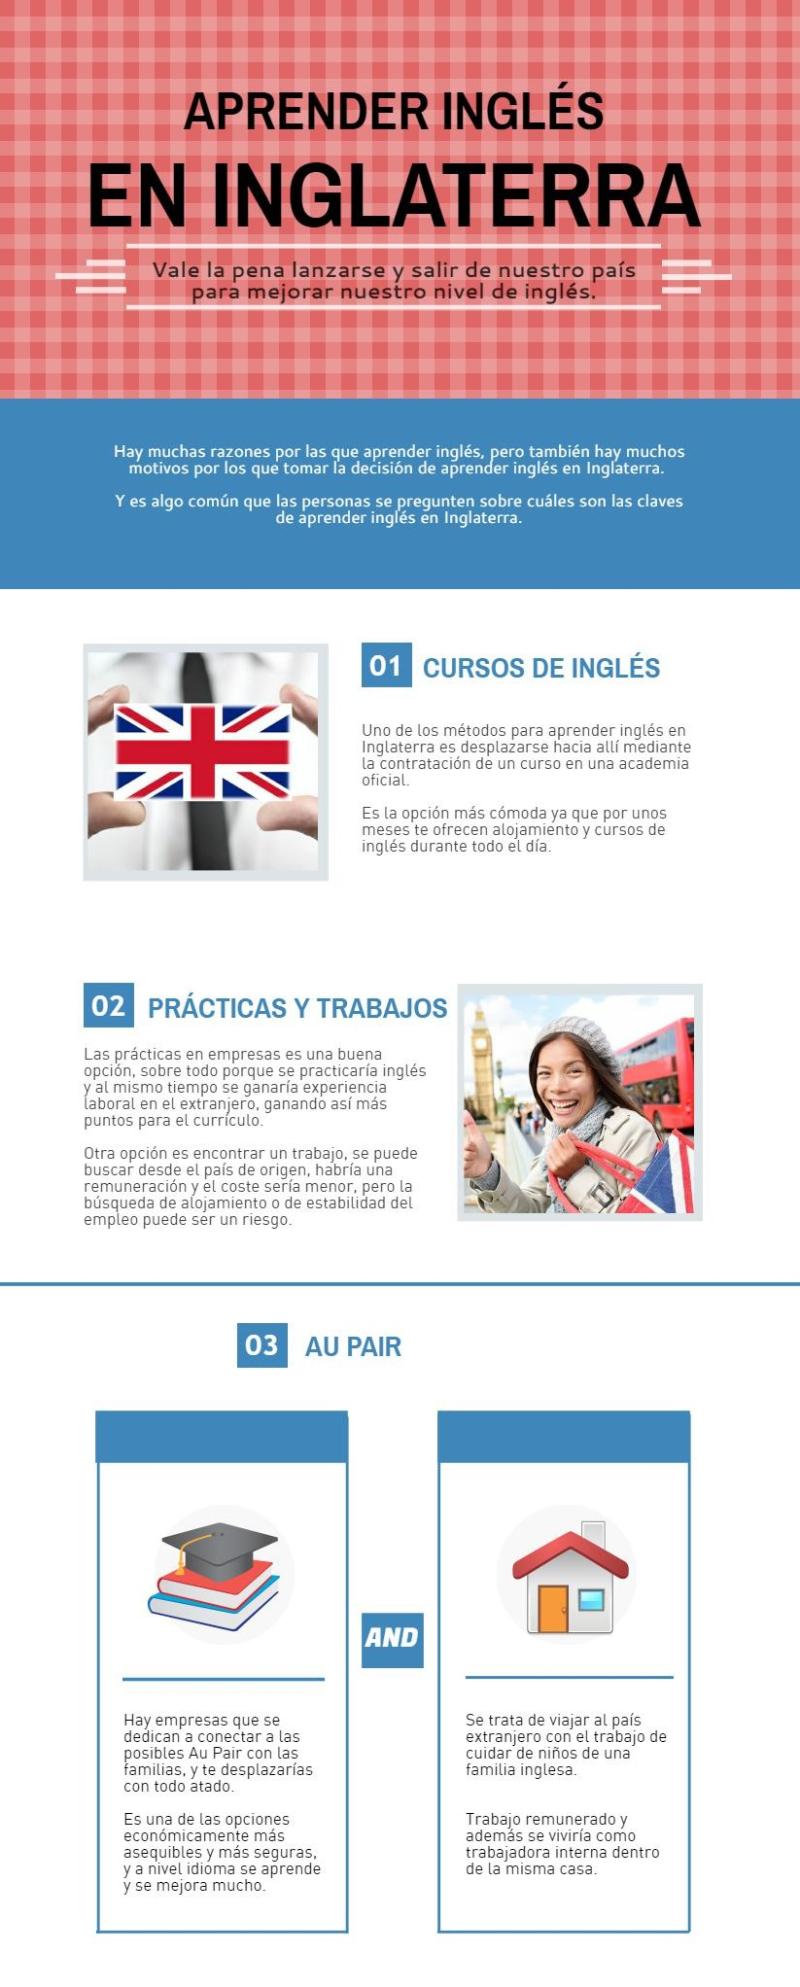 Apreder inglés en inglaterra